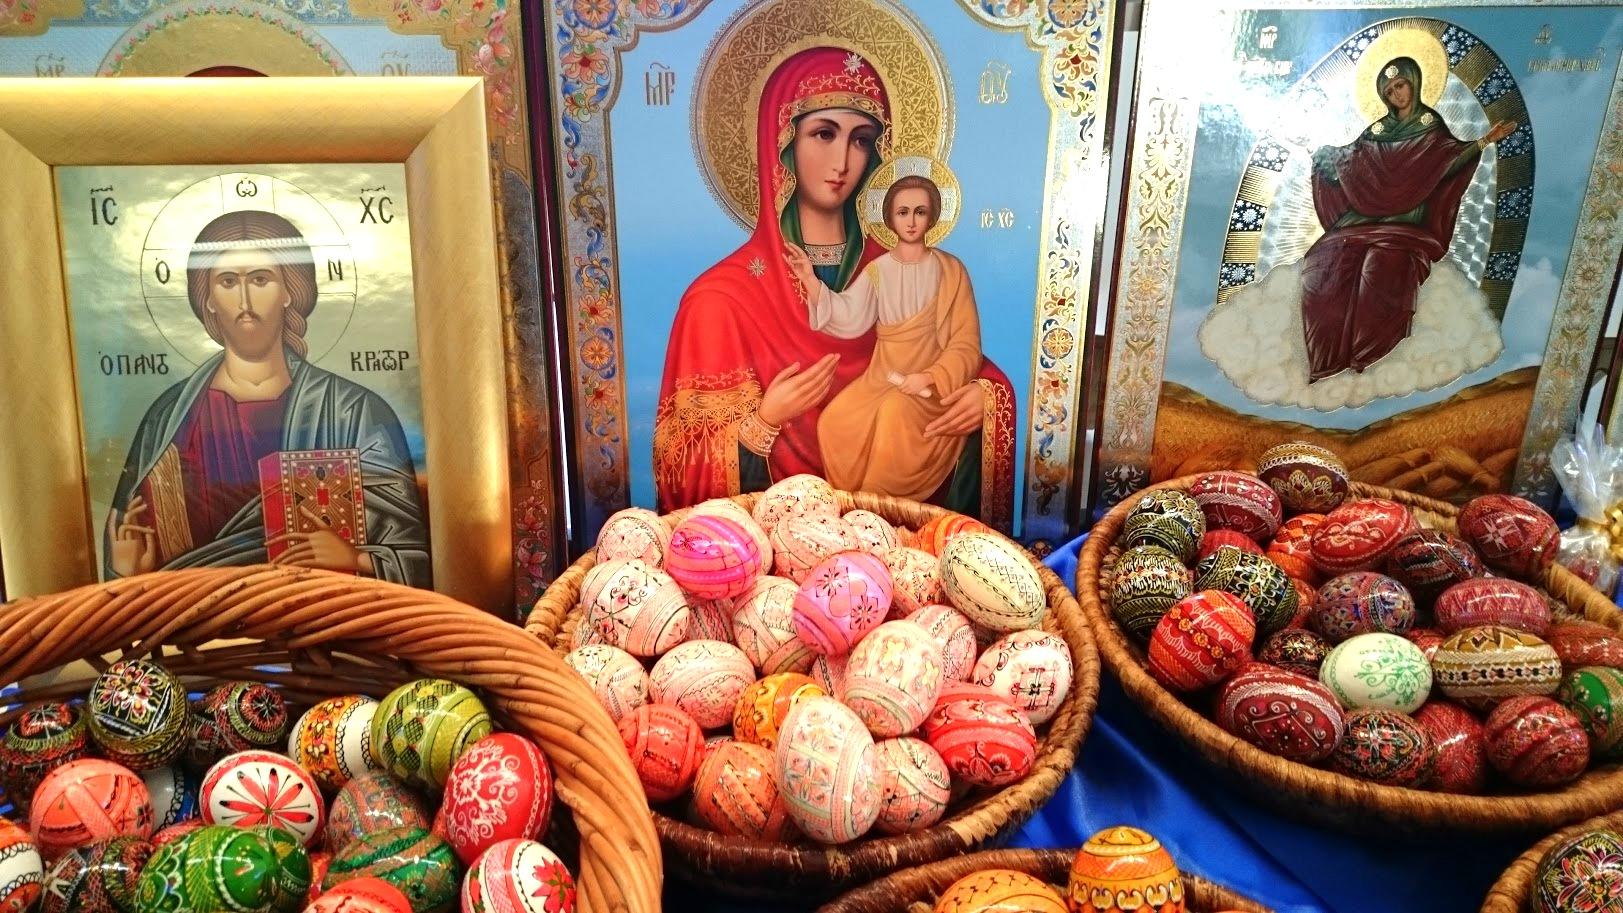 Valamon luostari ikoni pääsiäismunat